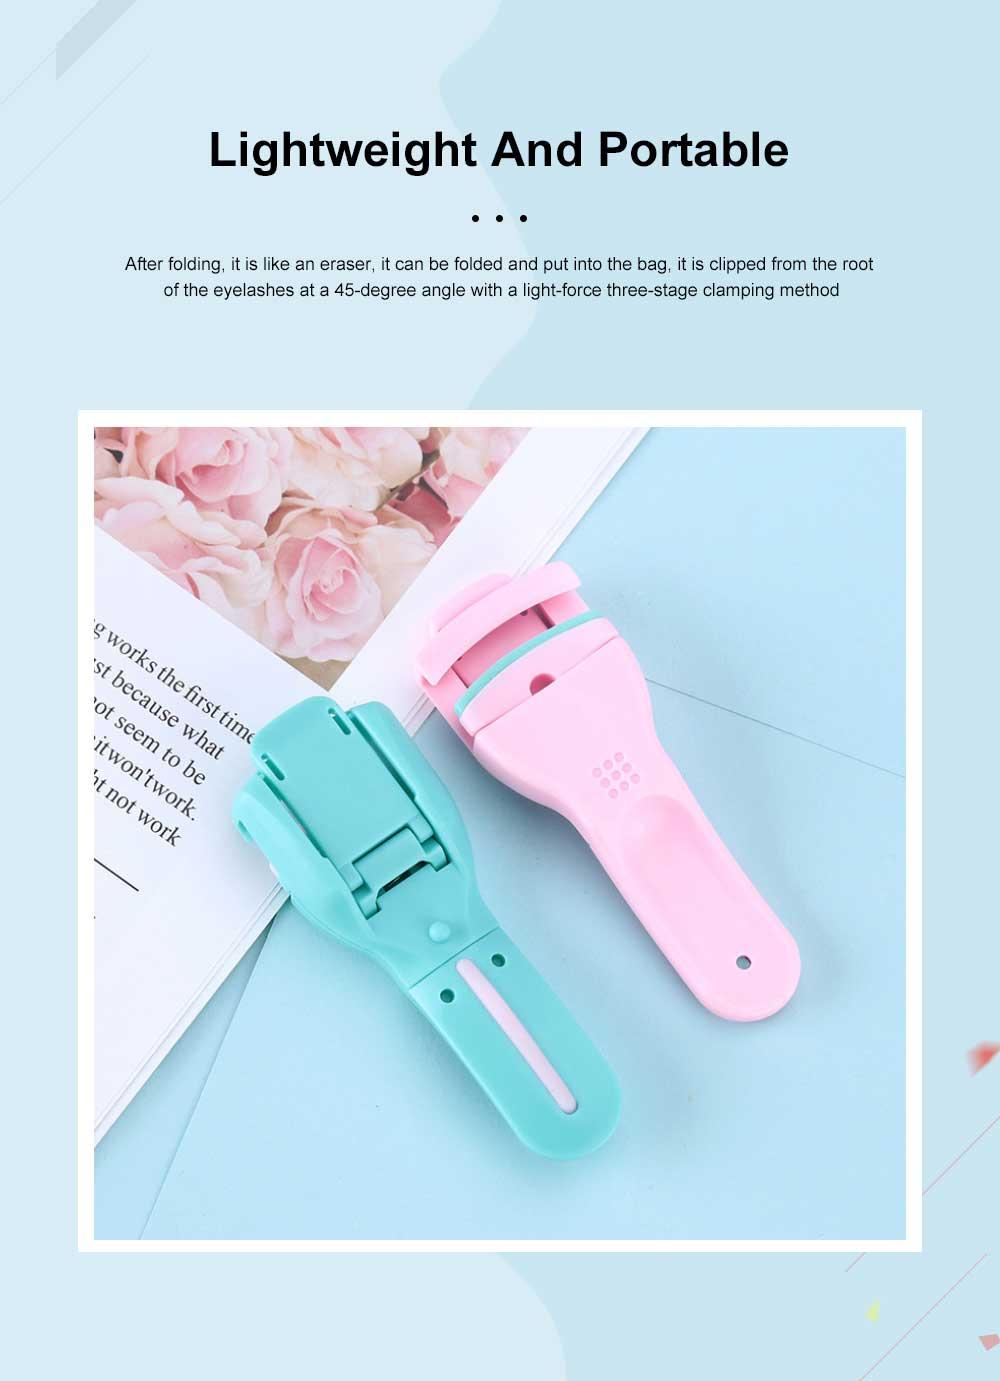 Silicone Eyelash Curler False Eyelash Extension Applicator Tool, Wholesale Portable Lightweight Bling Eyelash Curler 3